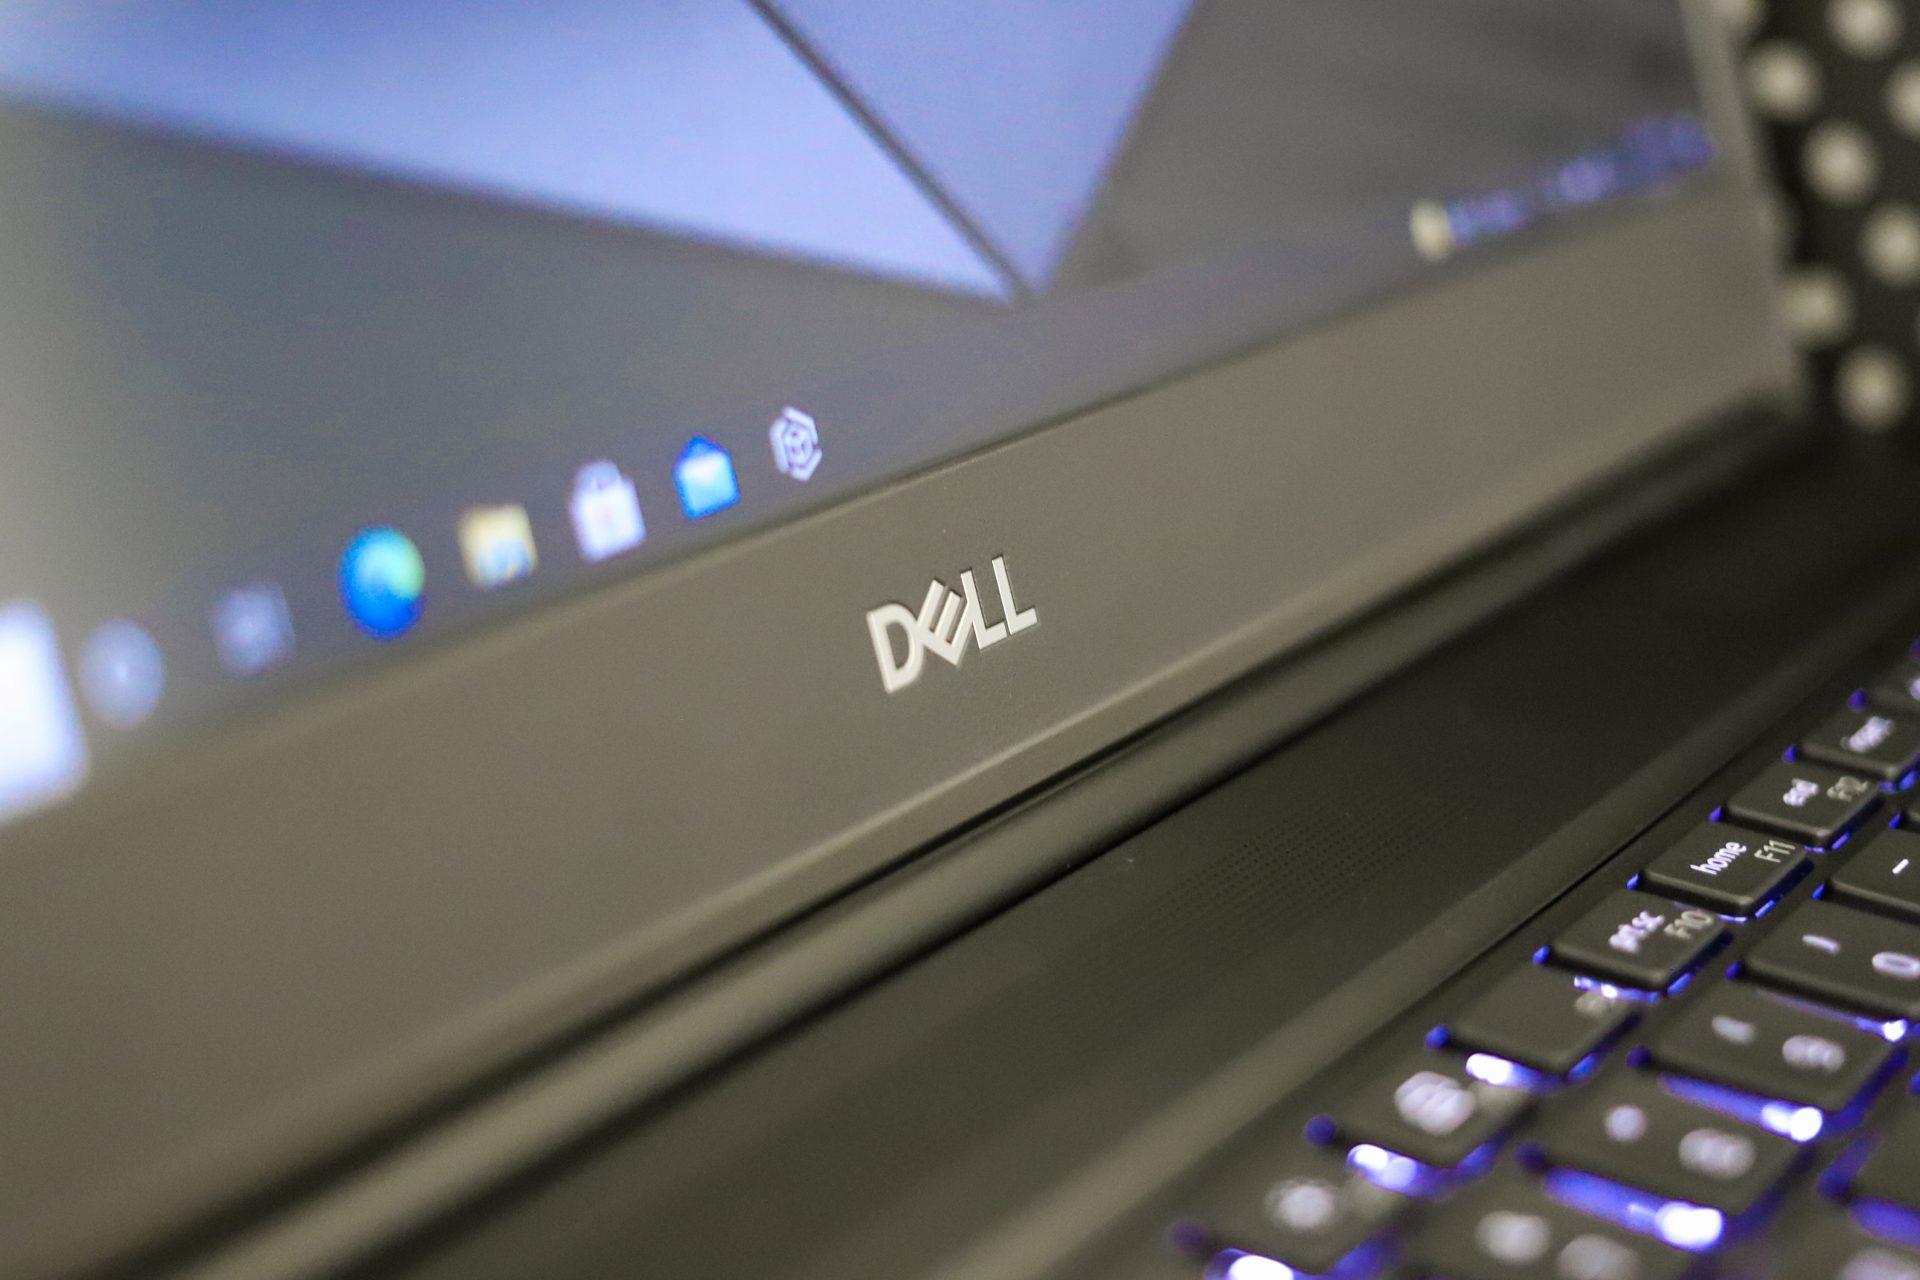 Dell Precision 7560 Lid Detail